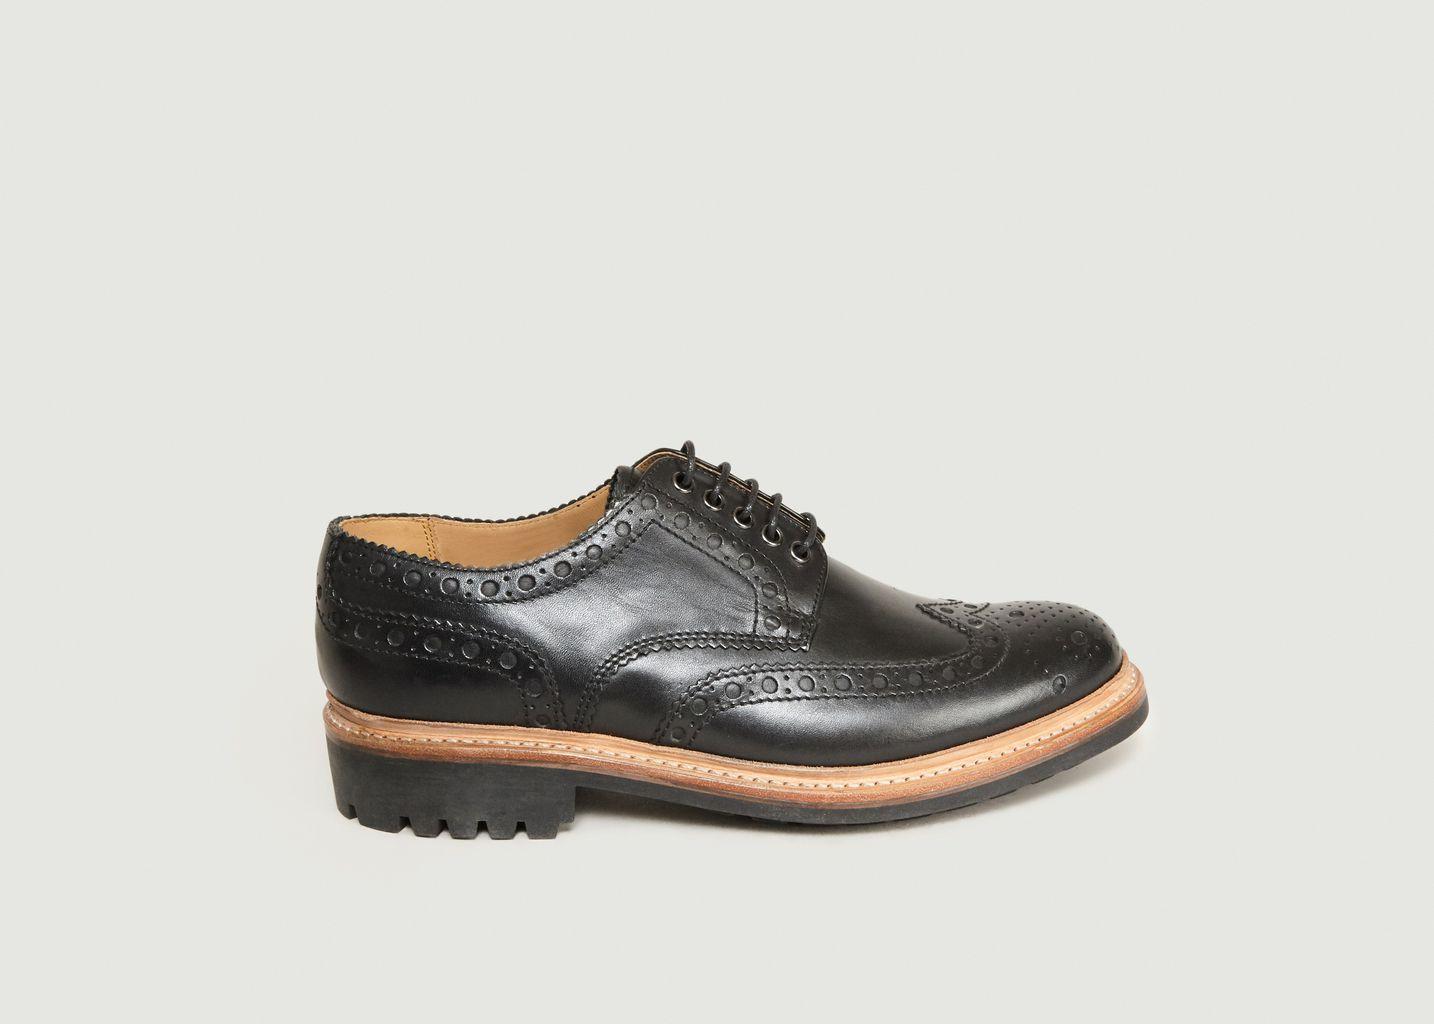 Chaussures Archie - Grenson